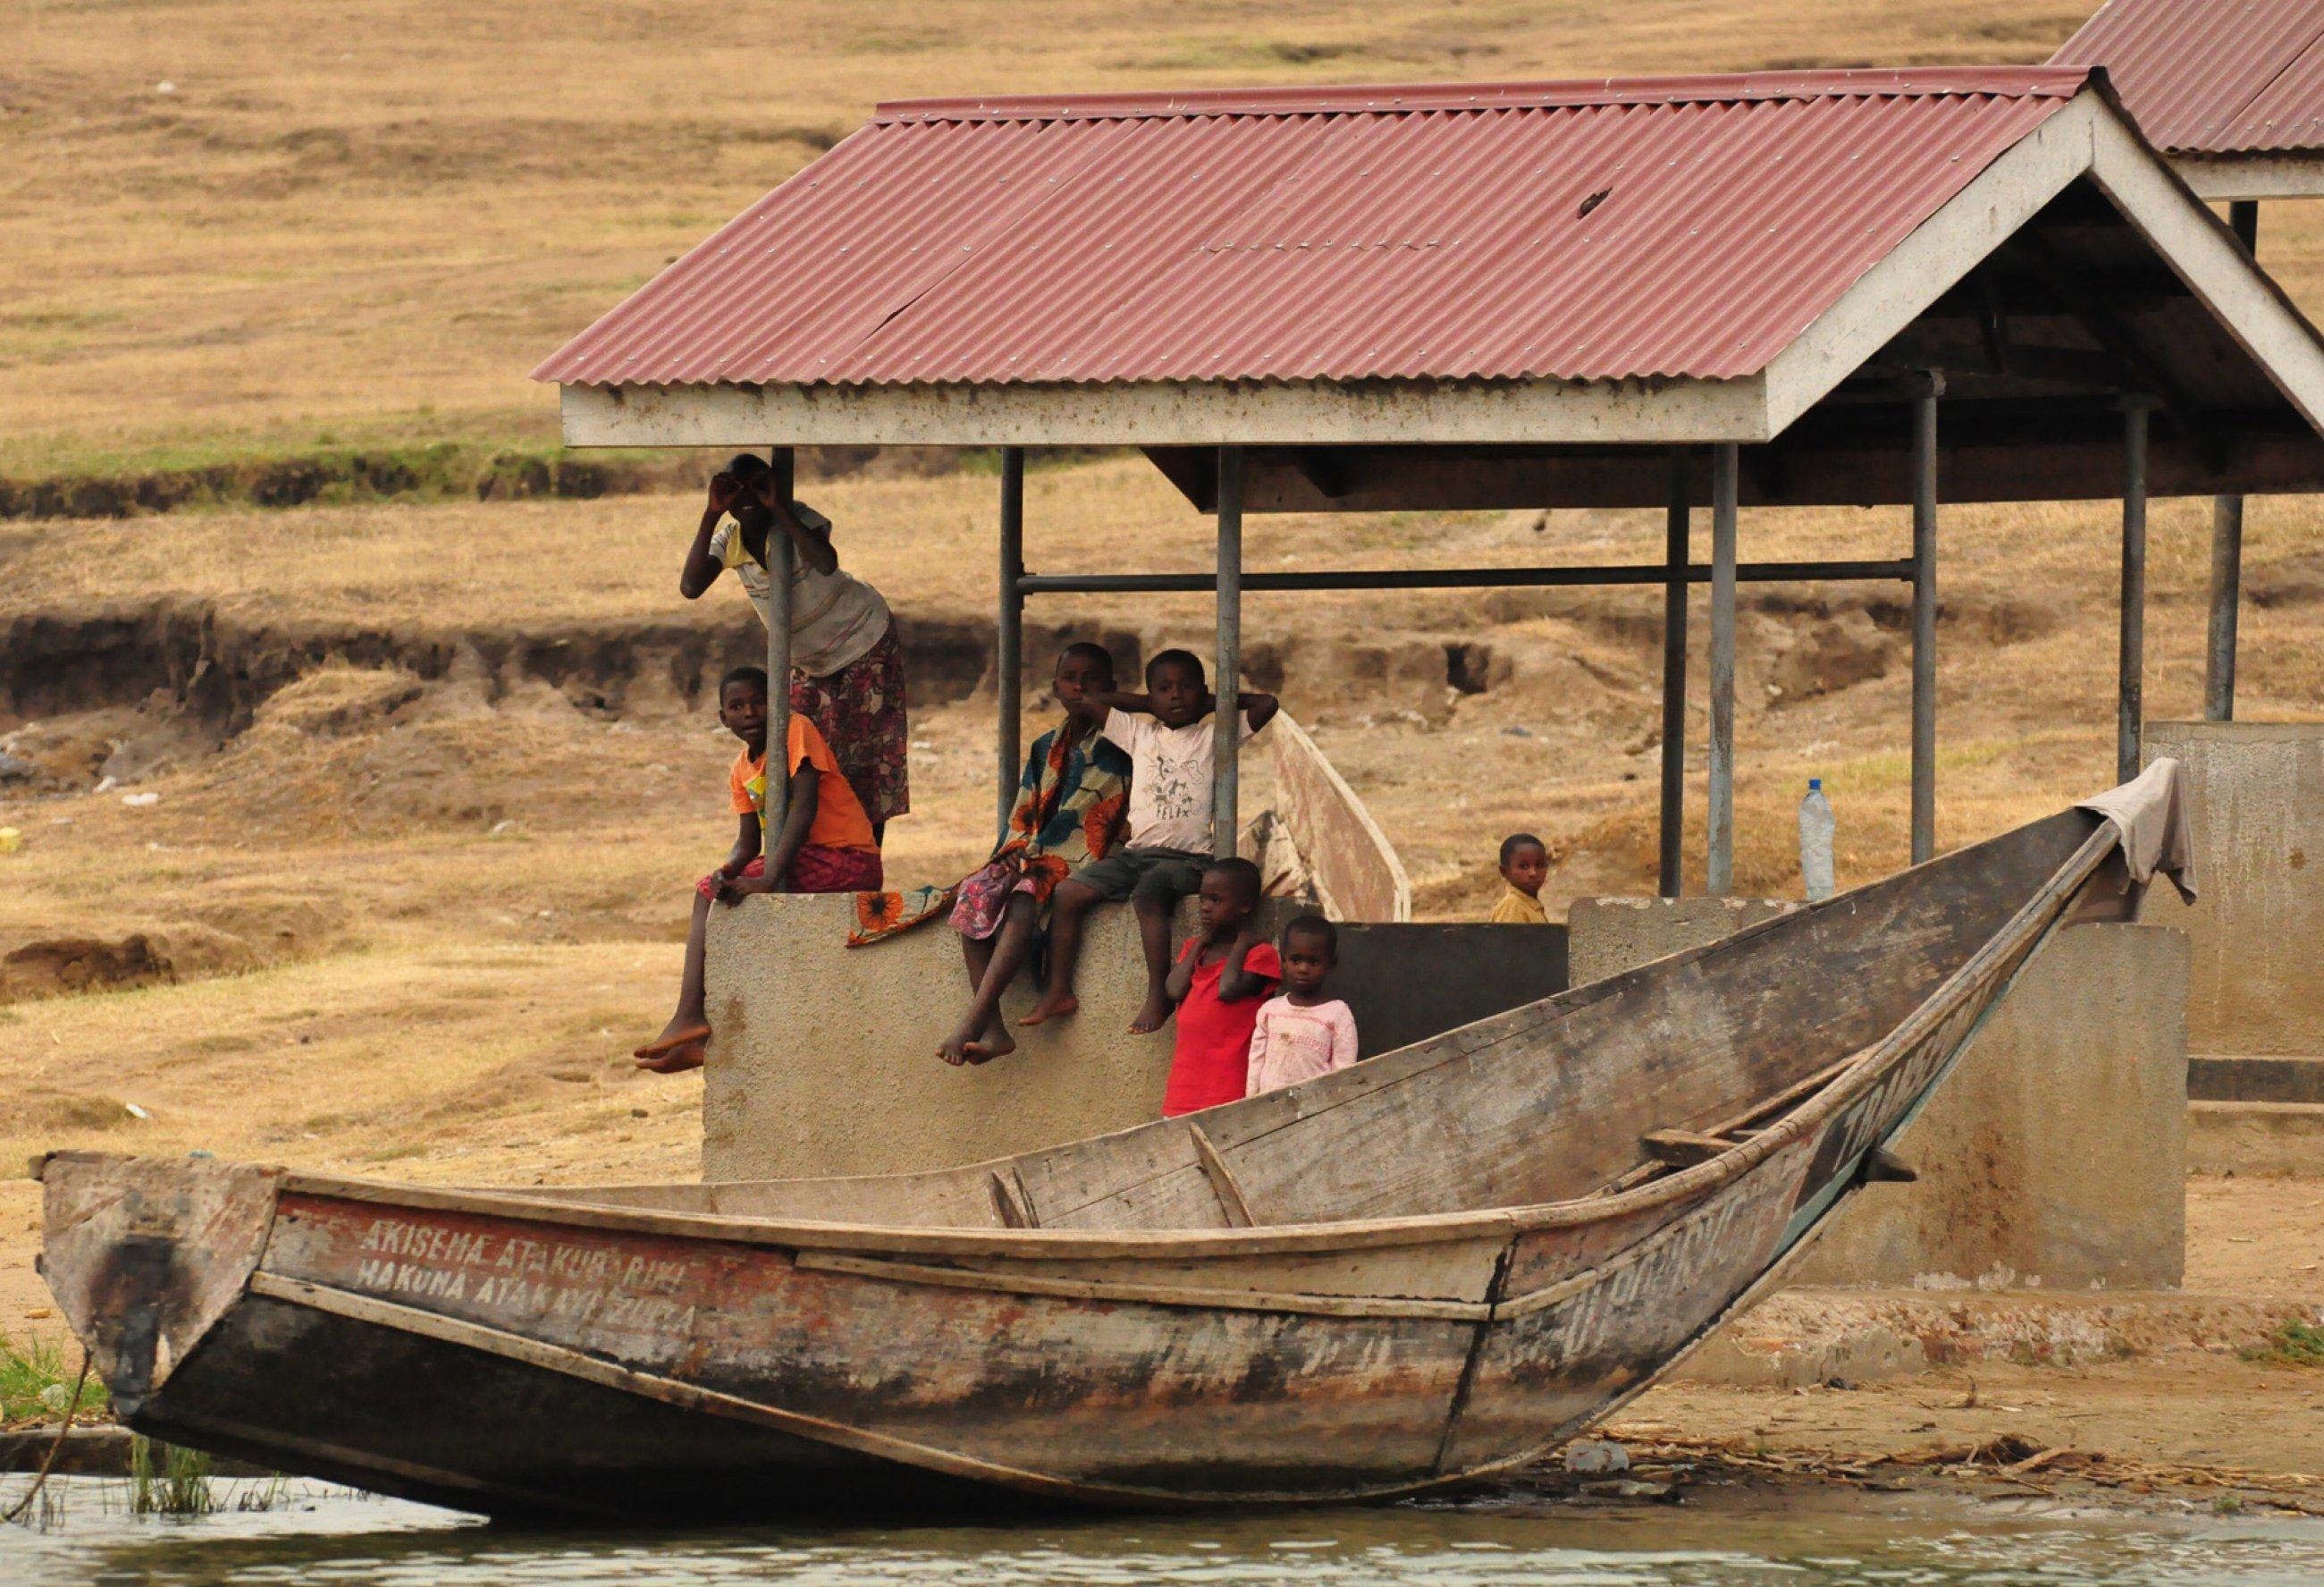 https://bubo.sk/uploads/galleries/4986/burundi-rwanda-uganda-kongo-martin-karnis-12-.jpg